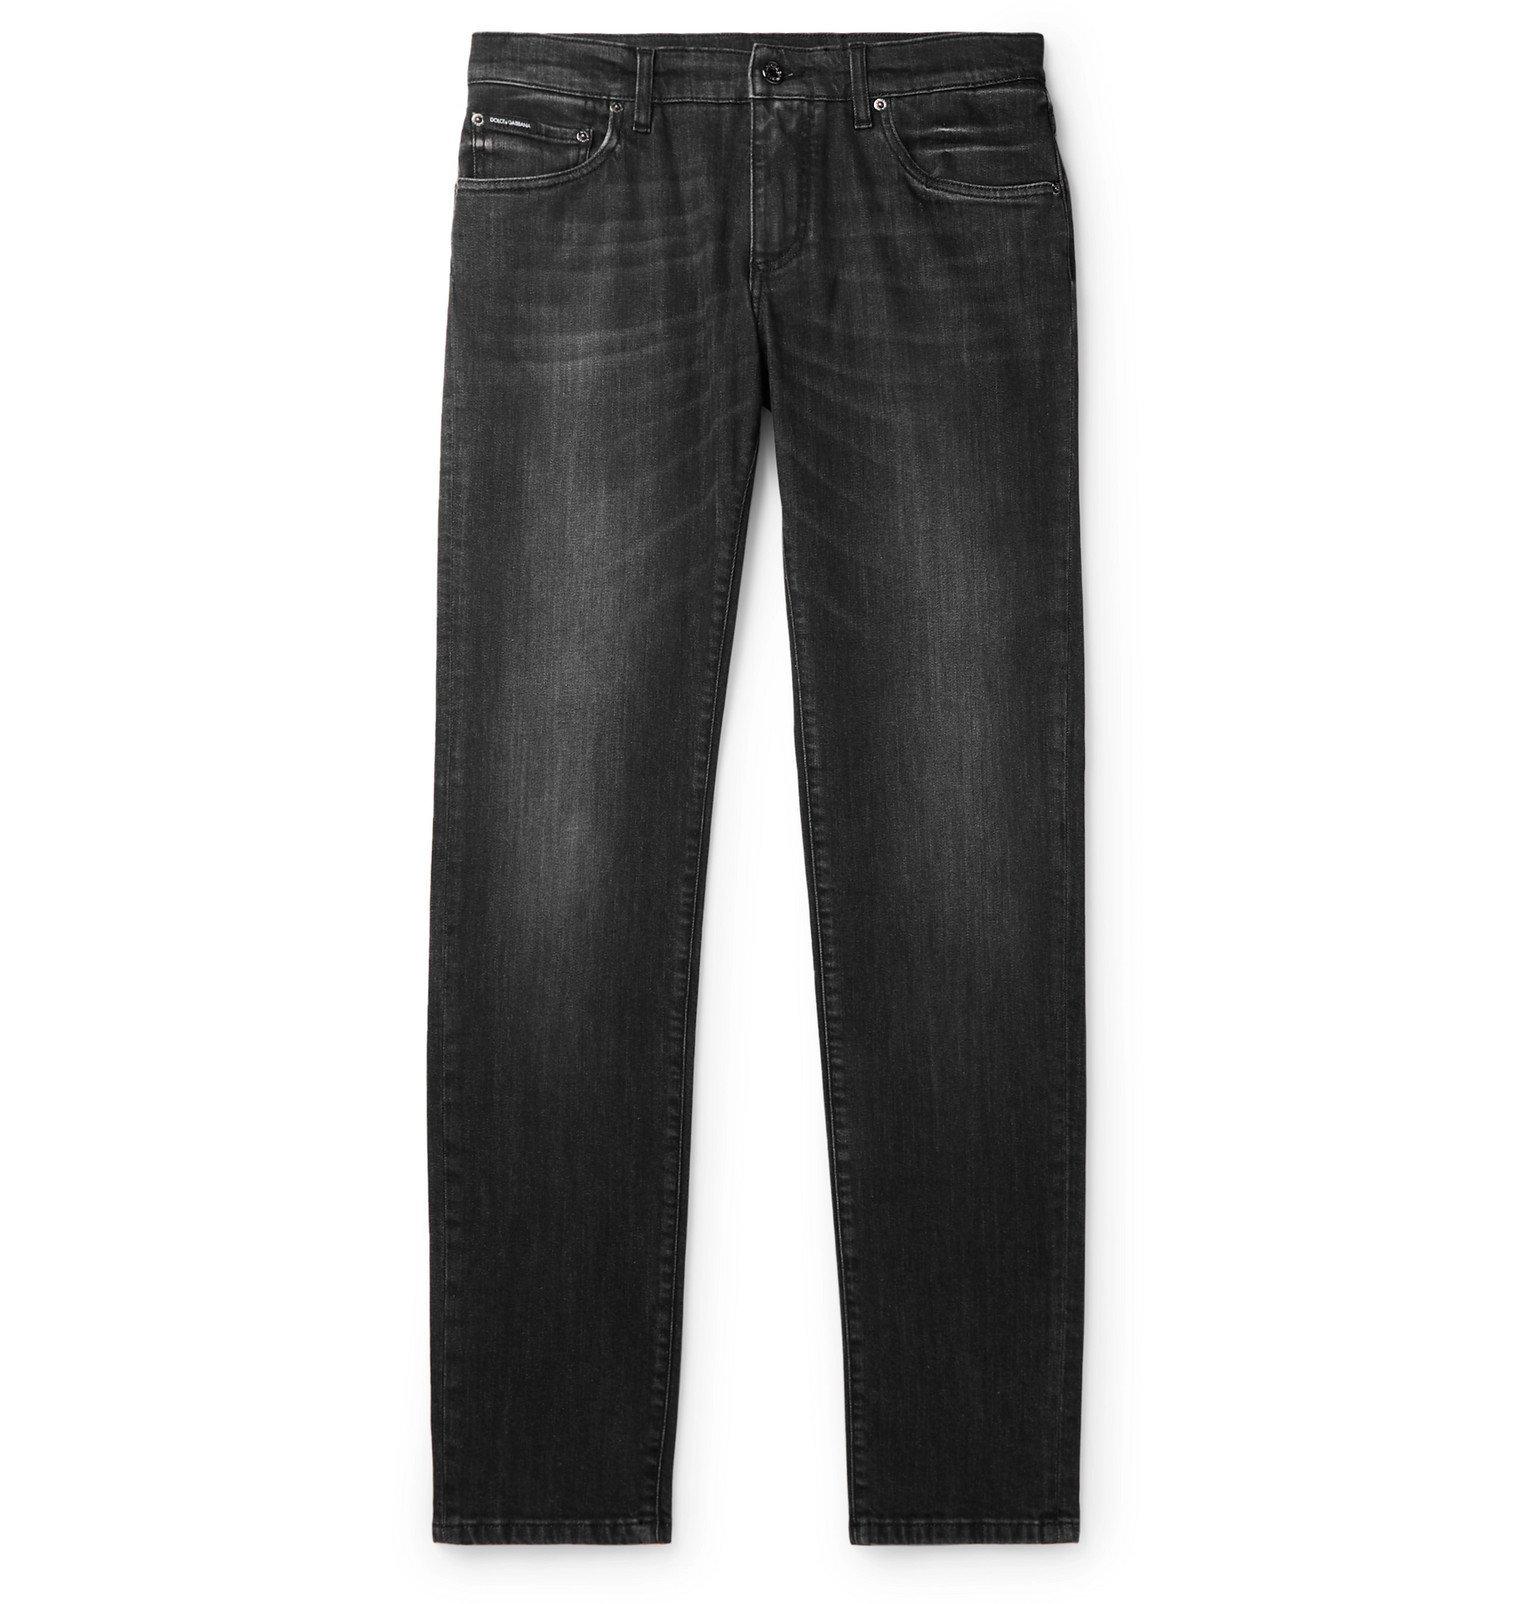 Dolce & Gabbana - Skinny-Fit Denim Jeans - Gray